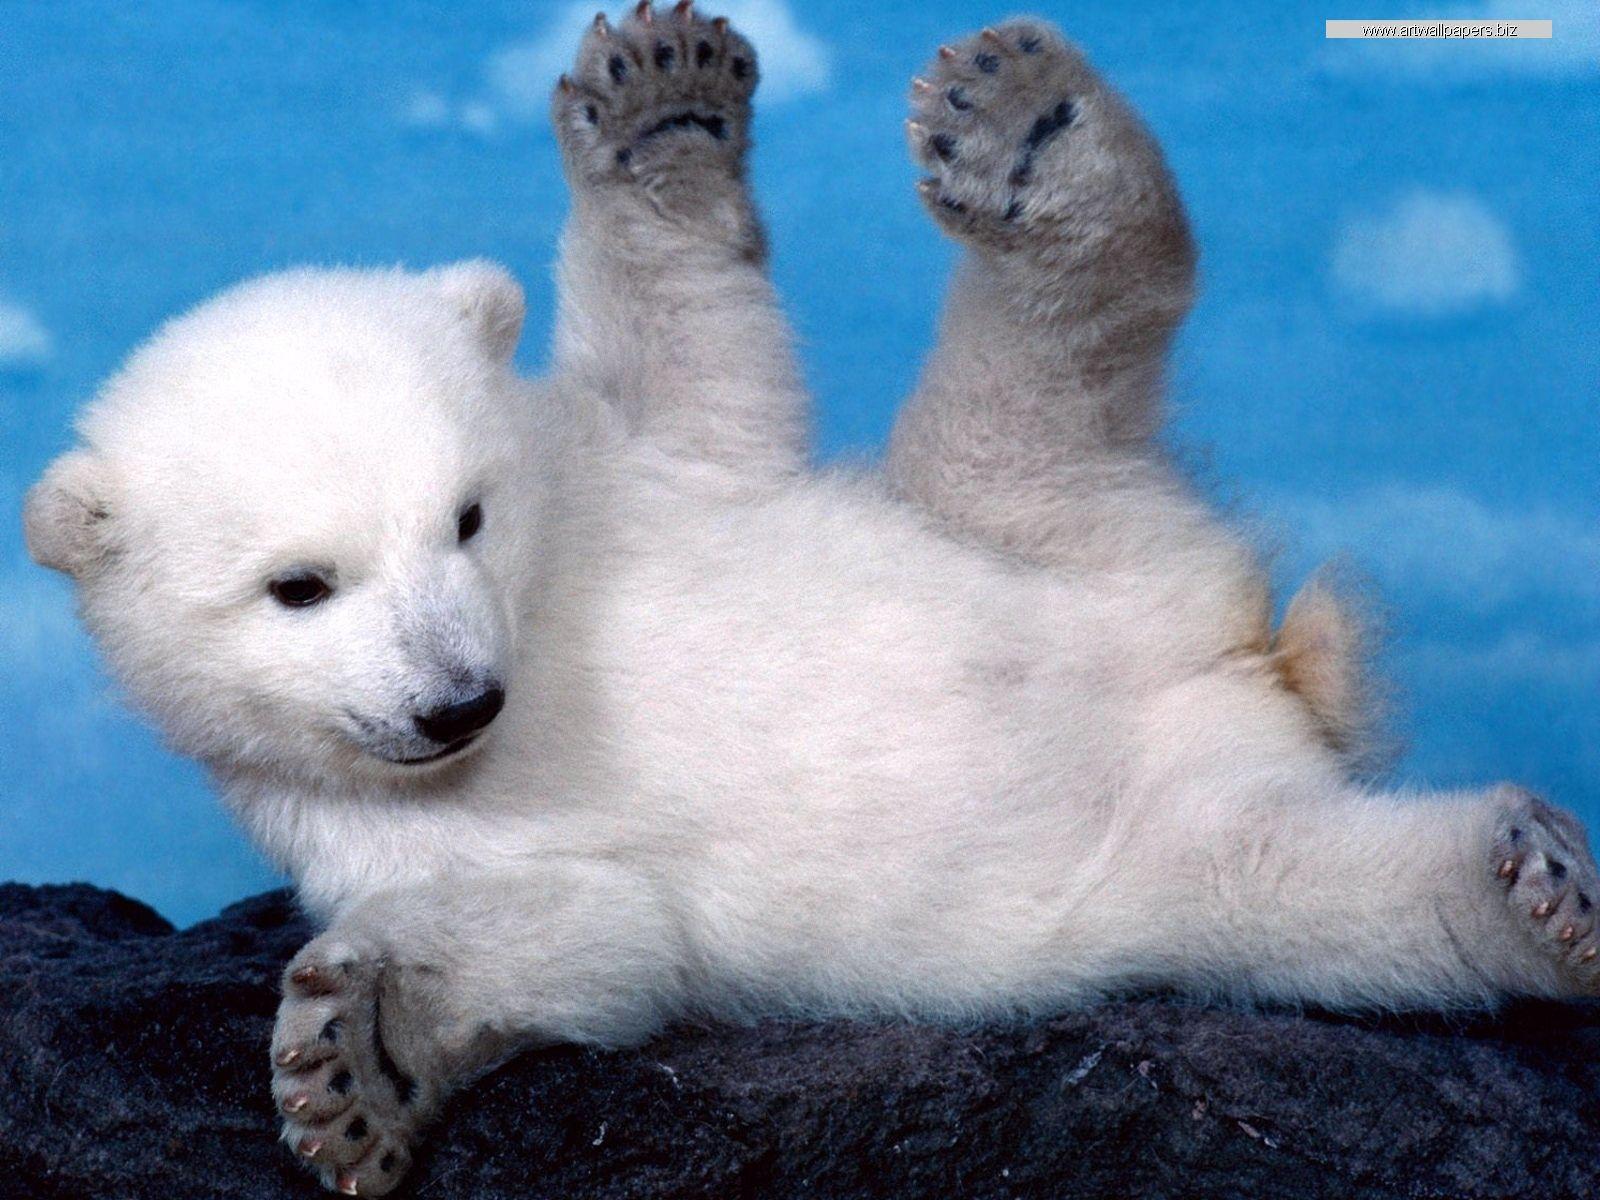 Http Www Arts Wallpapers Com Artwallpapersbiz Animals Wild Animals Images 31 Jpg Baby Polar Bears Polar Bear Wallpaper Baby Animals Pictures